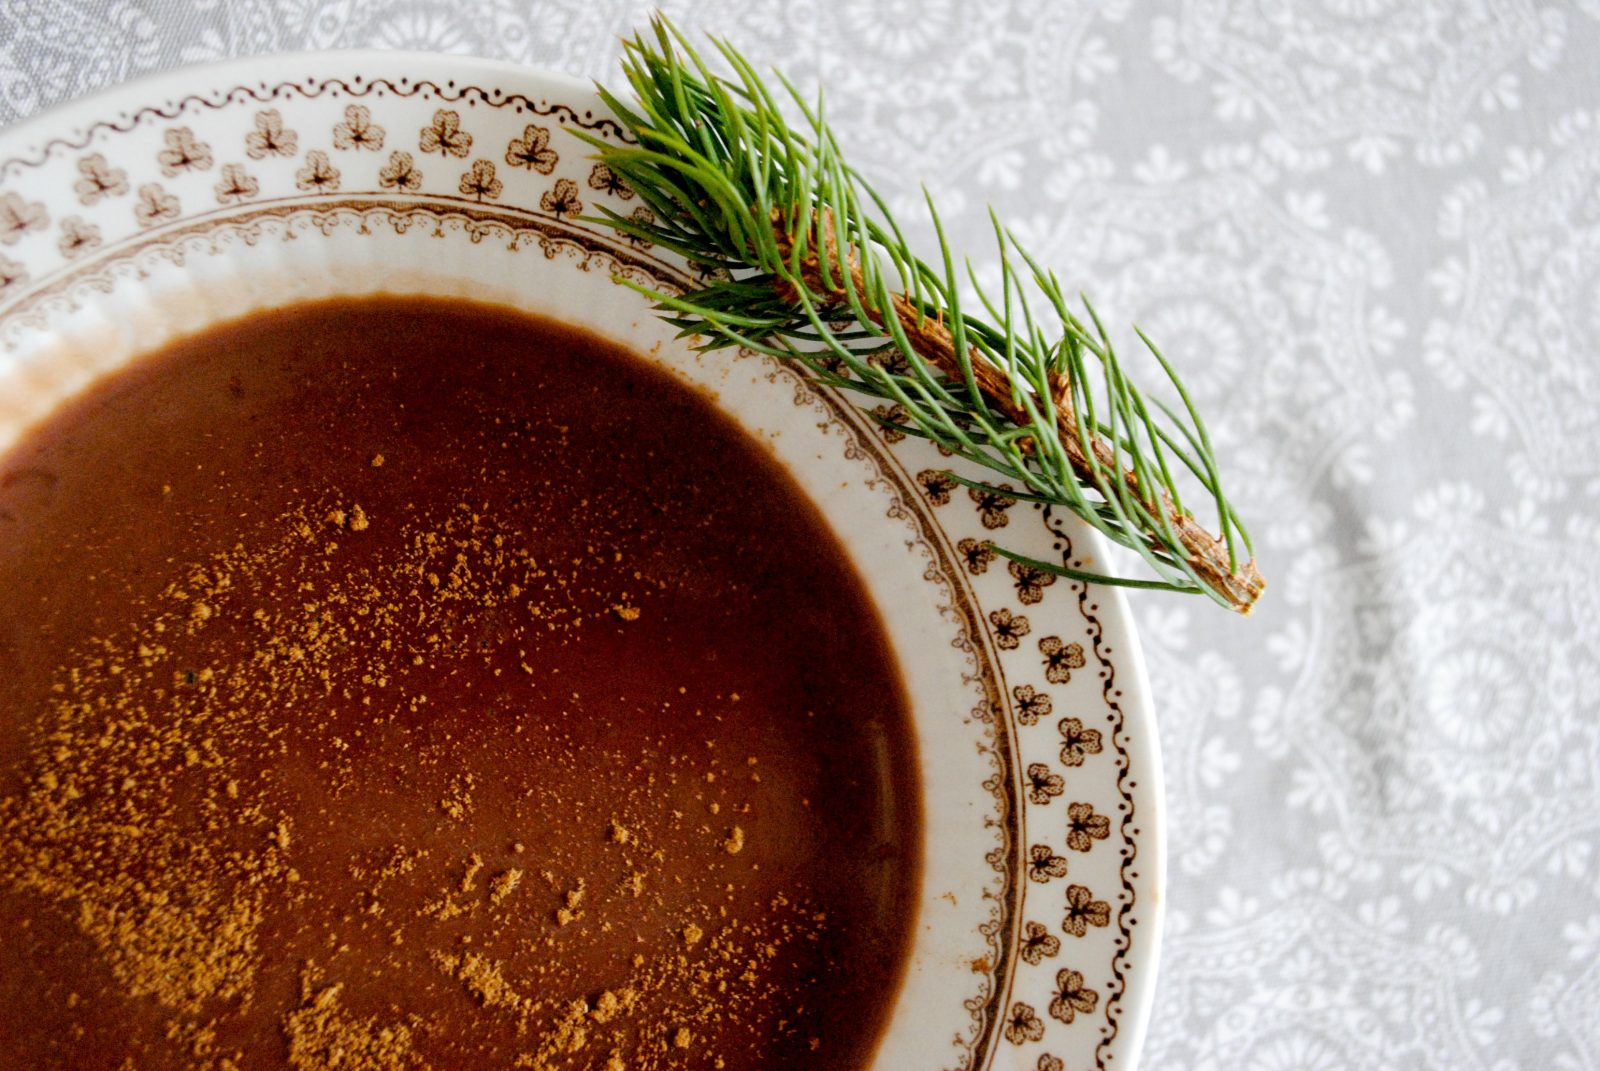 Exploring Icelandic Cuisine with Expedia: Icelandic Cocoa Soup